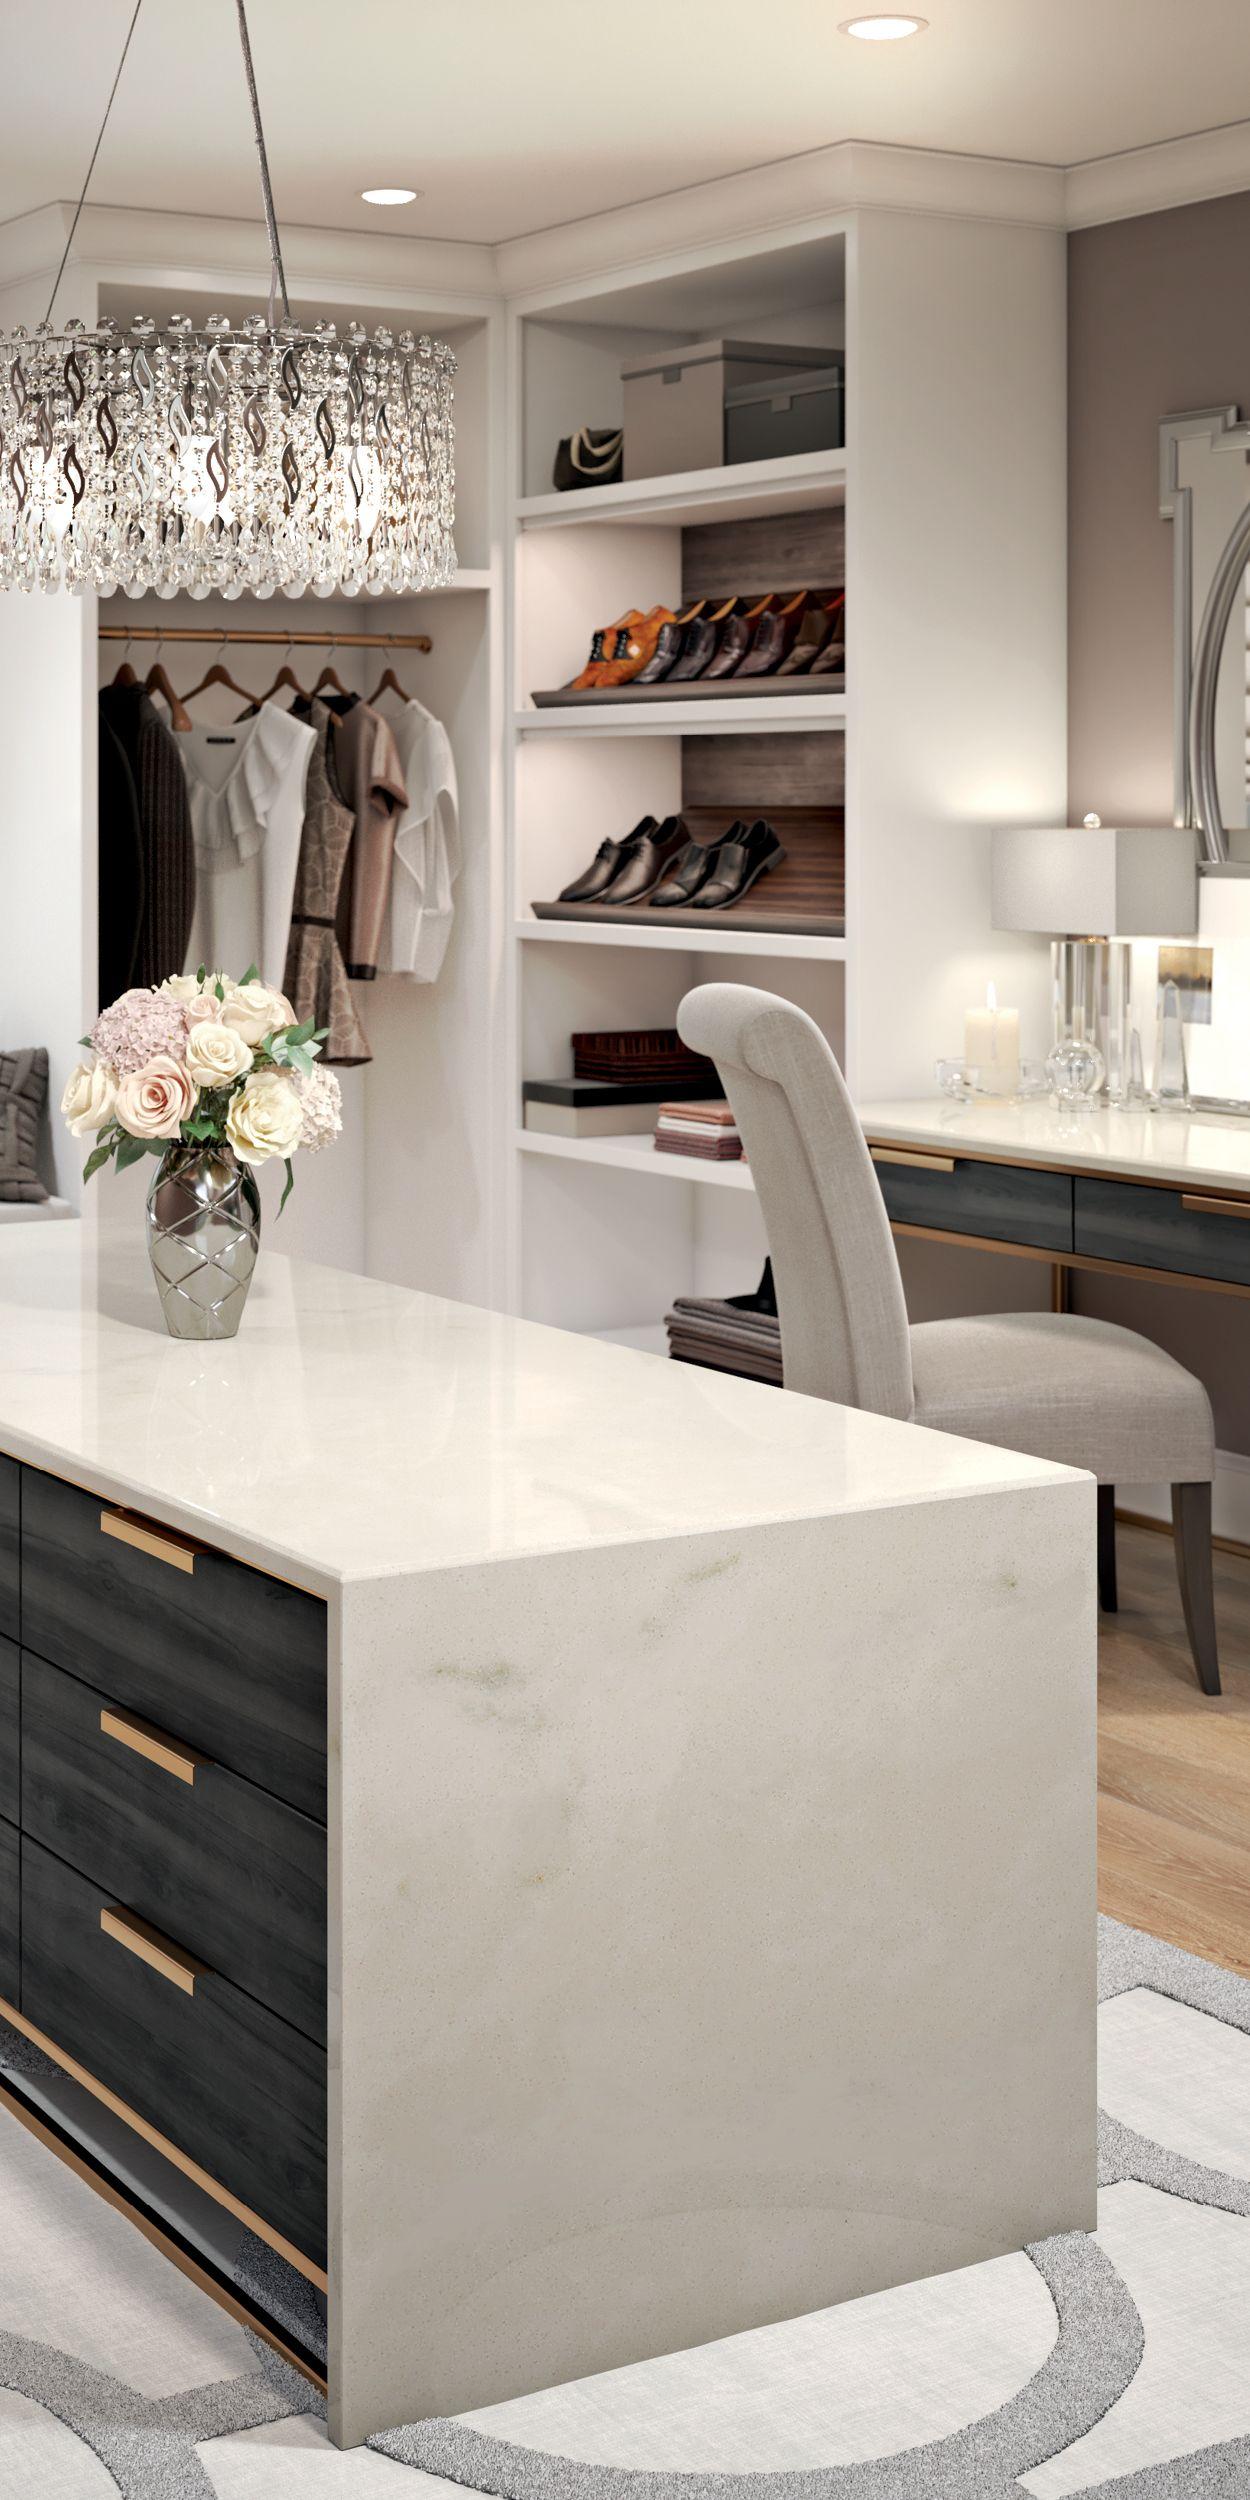 Daltile One Quartz Surfaces Nature Series Carrara Veil Family Room Remodel Home Renovation Daltile